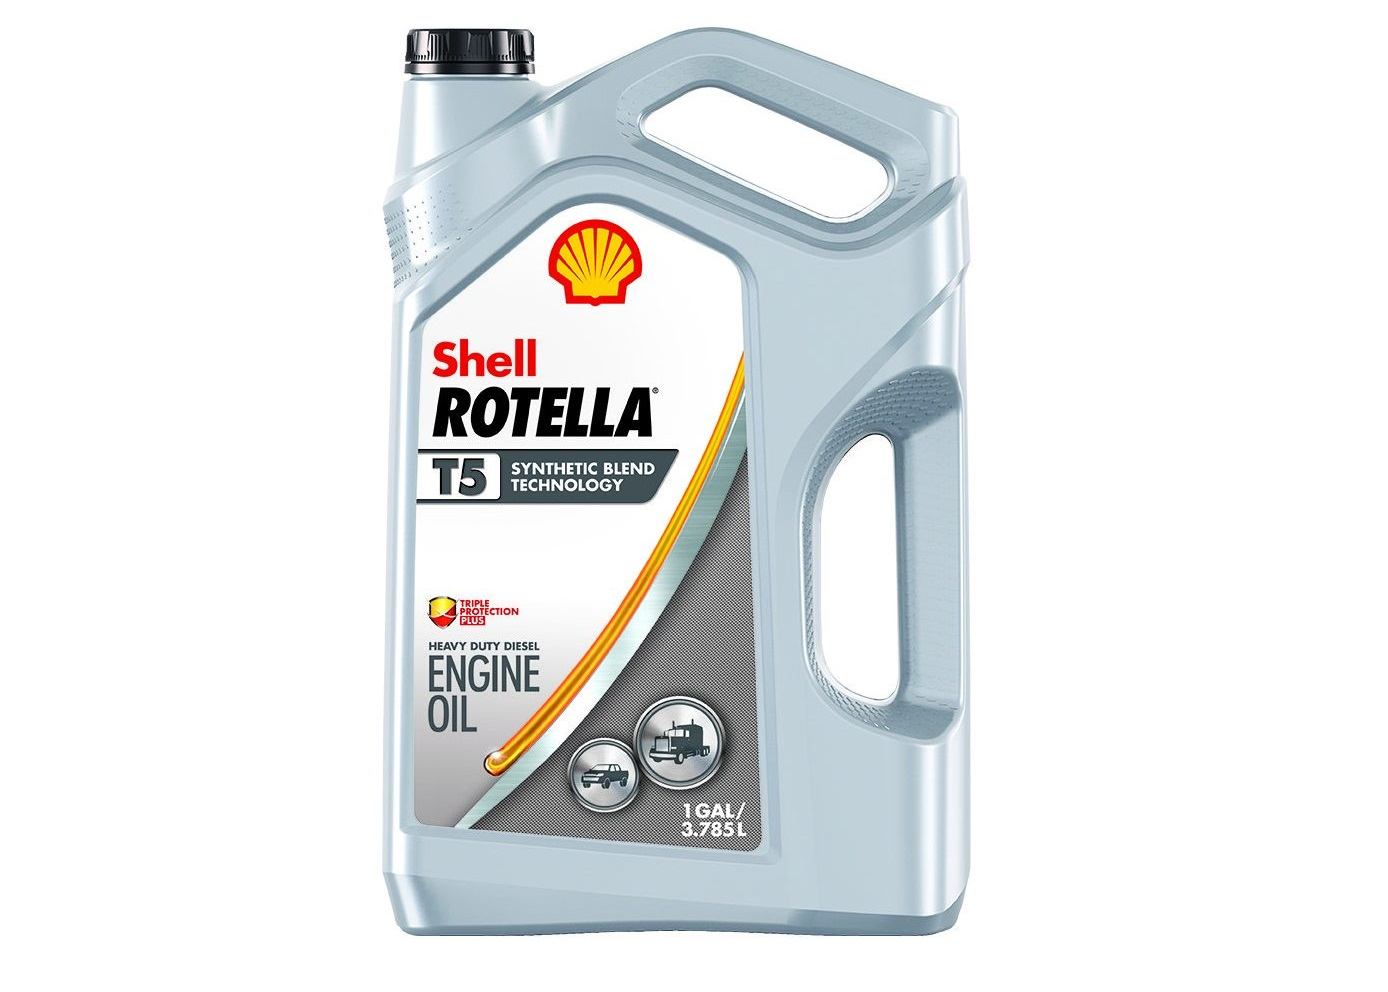 Ford Approves Trio of Shell Oils for Diesel Trucks